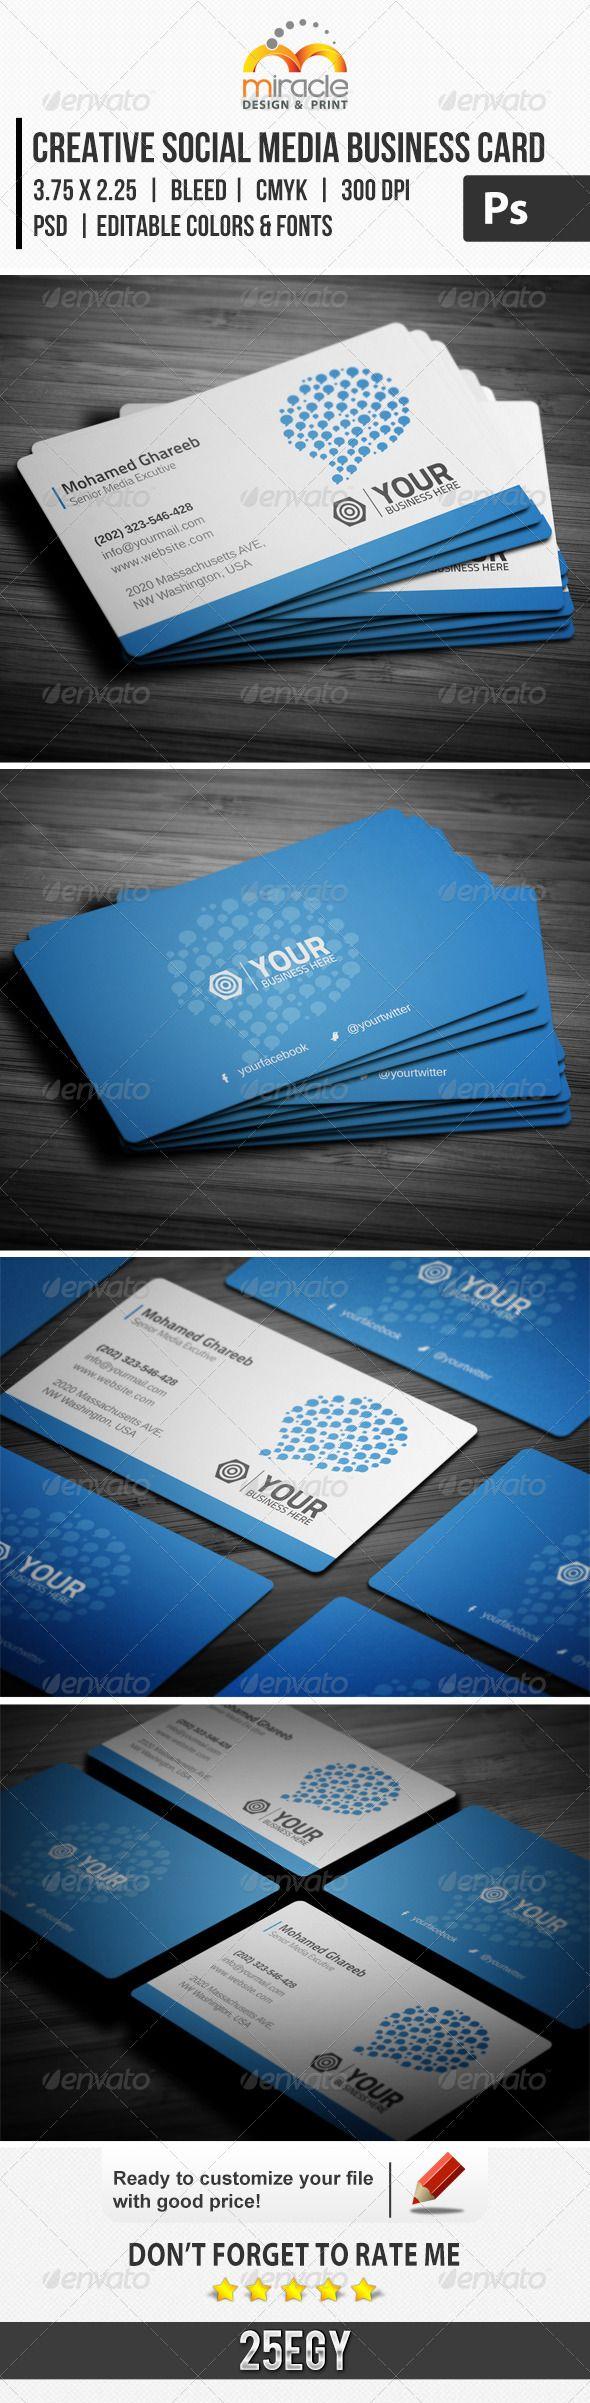 86 Best Business Card Images On Pinterest Graphics Graph Design